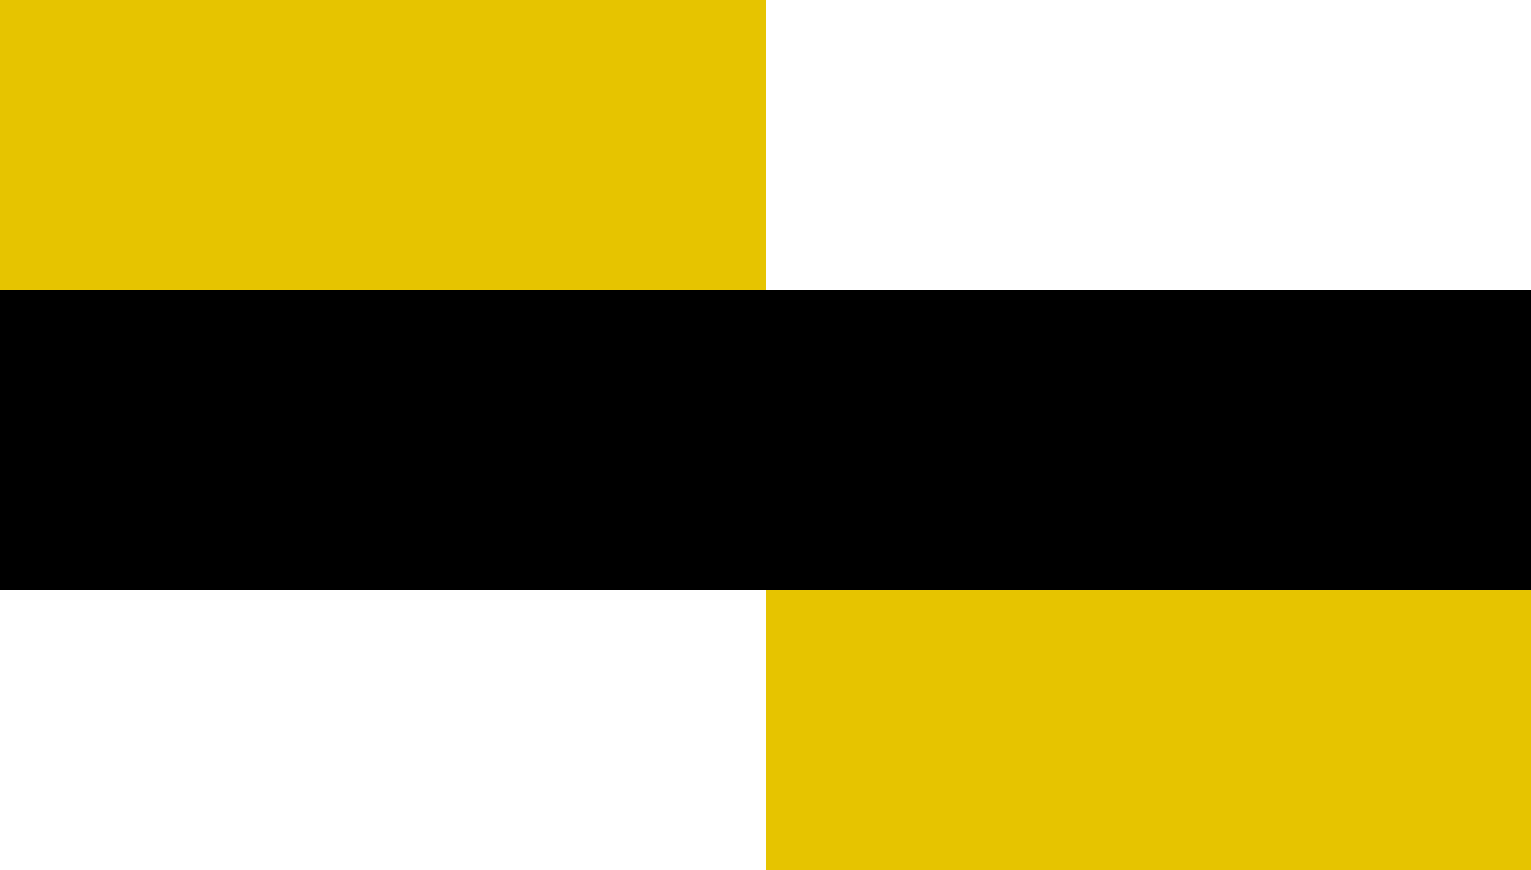 Súdwerstæó Empire (1678-1918)